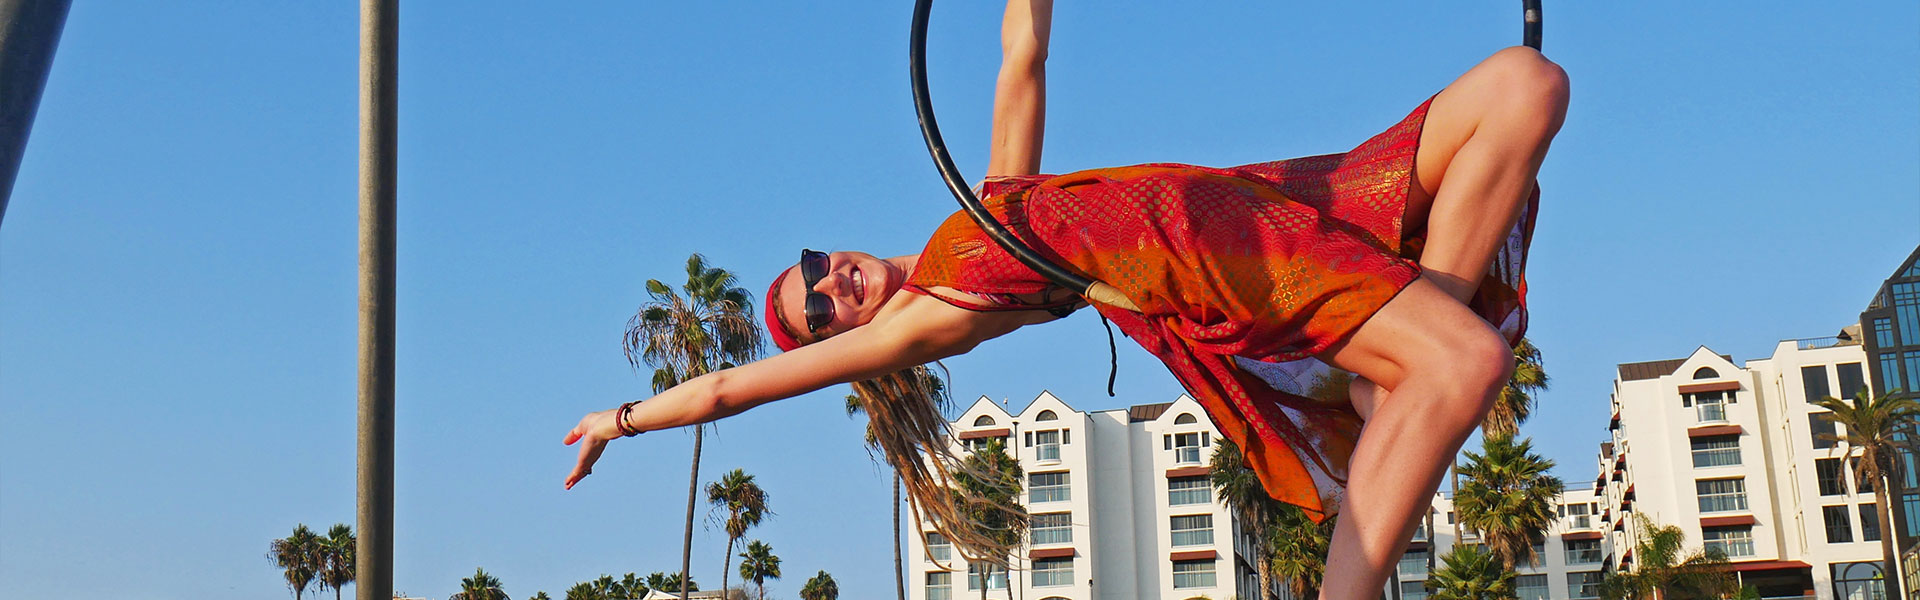 Rasta girl in hoop at original muscle beach in Santa Monica, CA